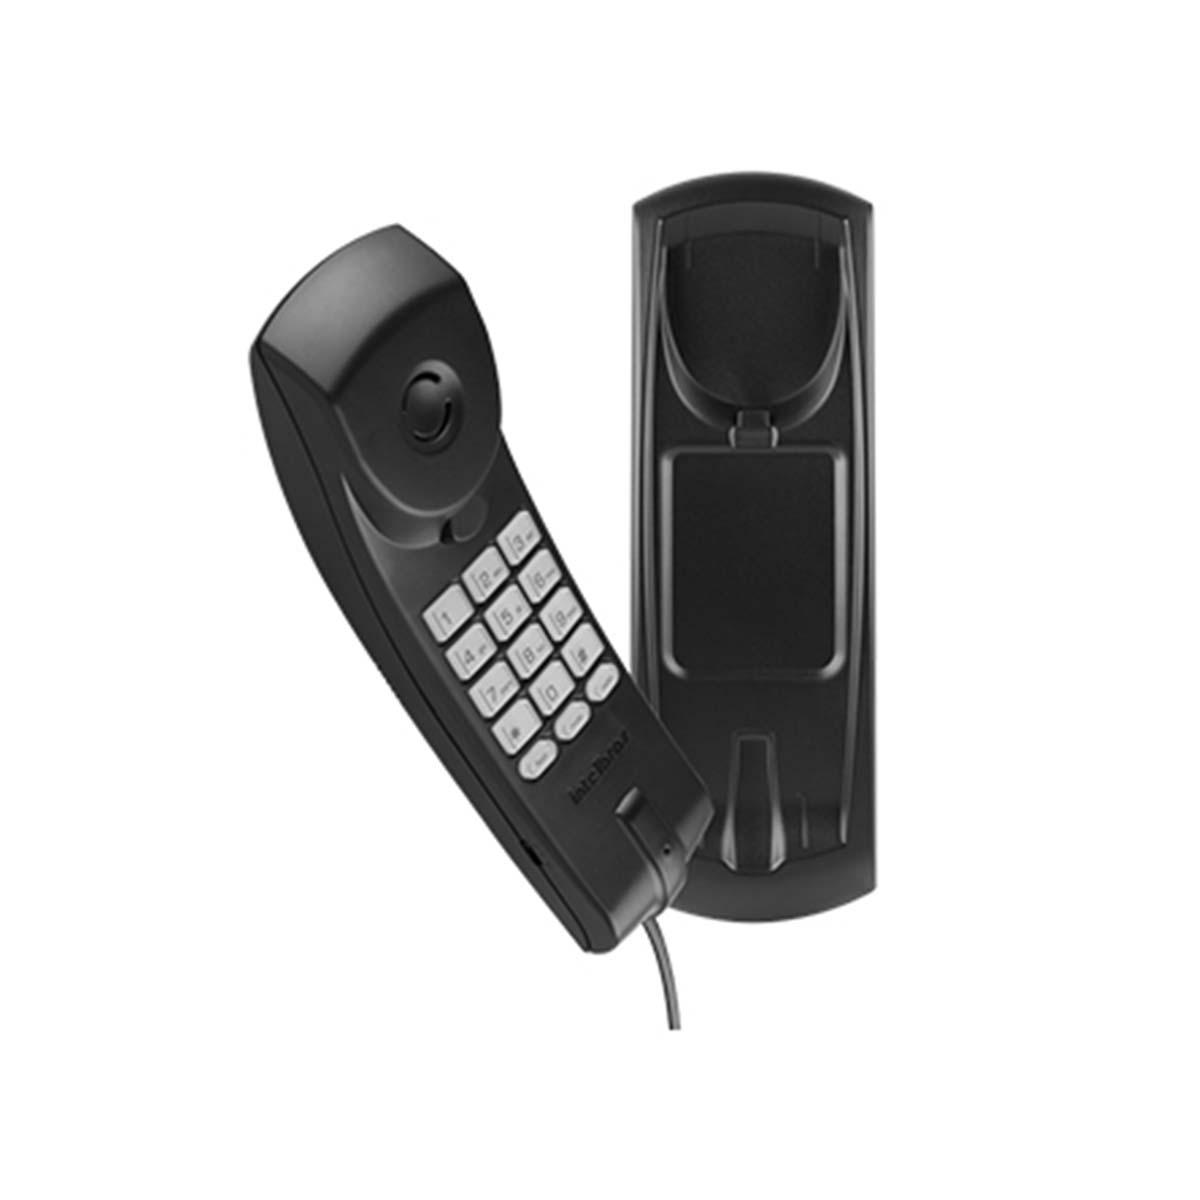 Kit 07 Telefone Intelbras Com Fio Gondola Tc20 Preto